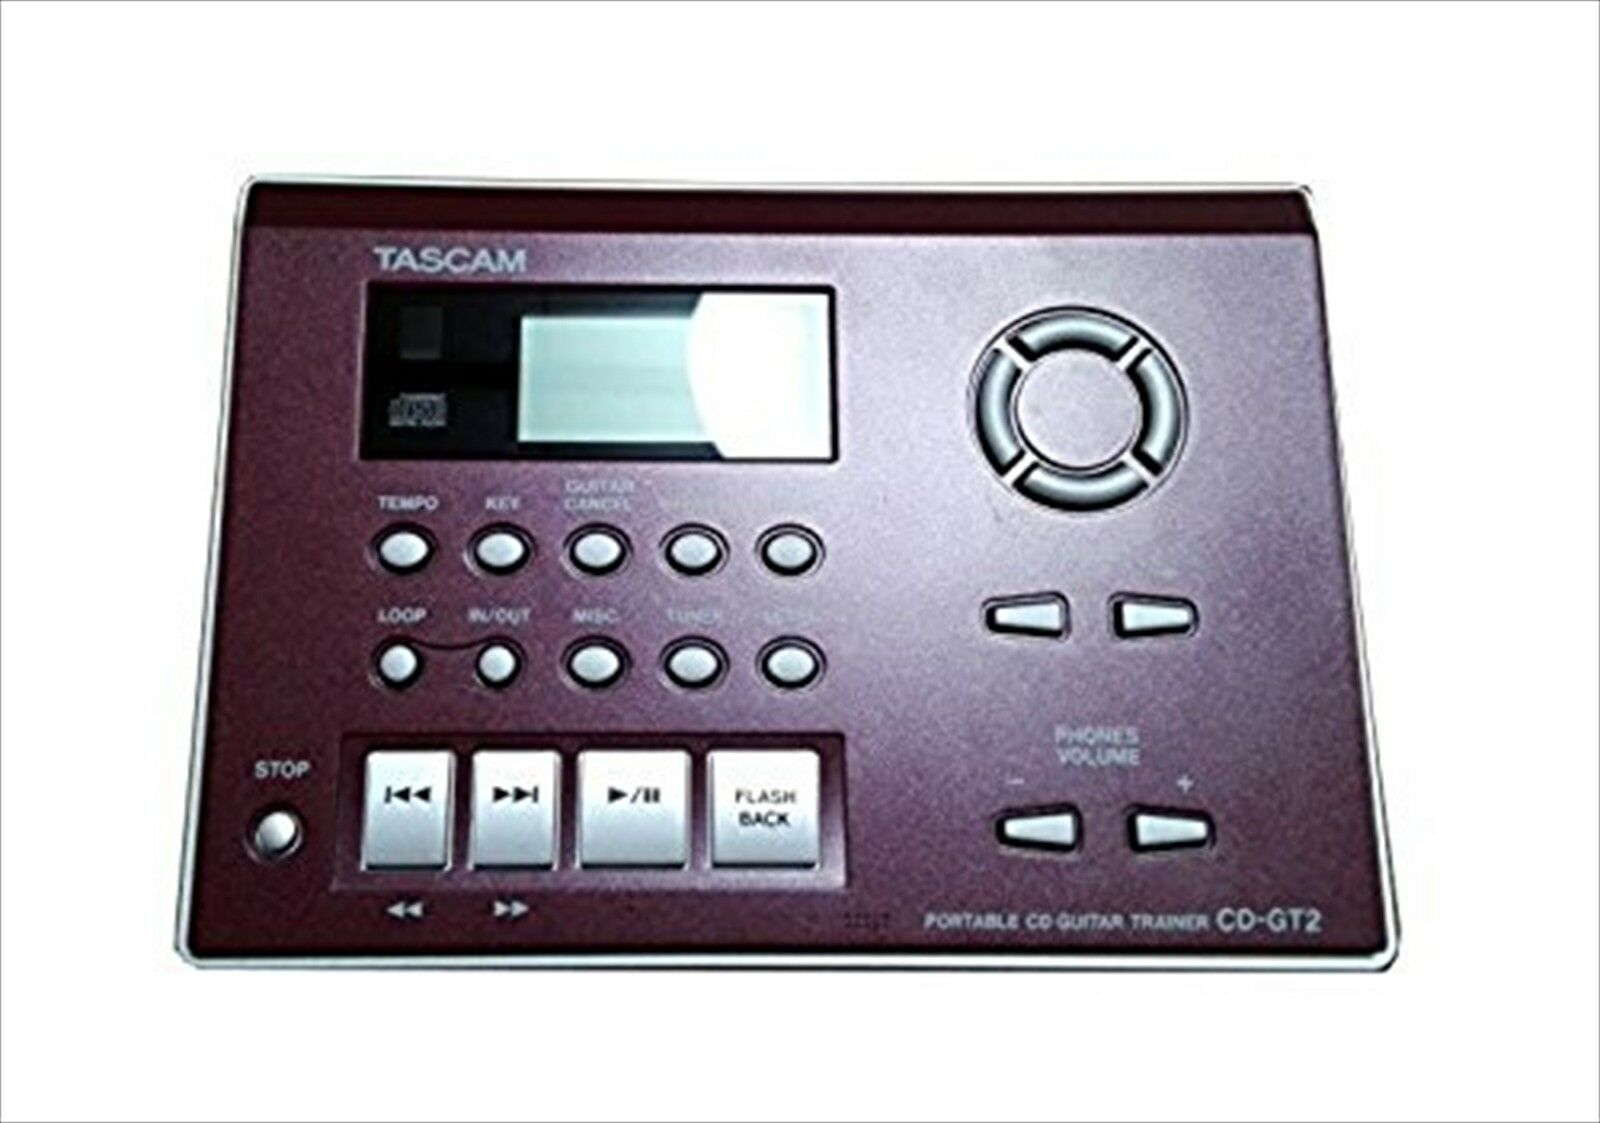 Tascam CD-GT2 Tragbare Gitarre Trainer Speed Playback Integrates Fx